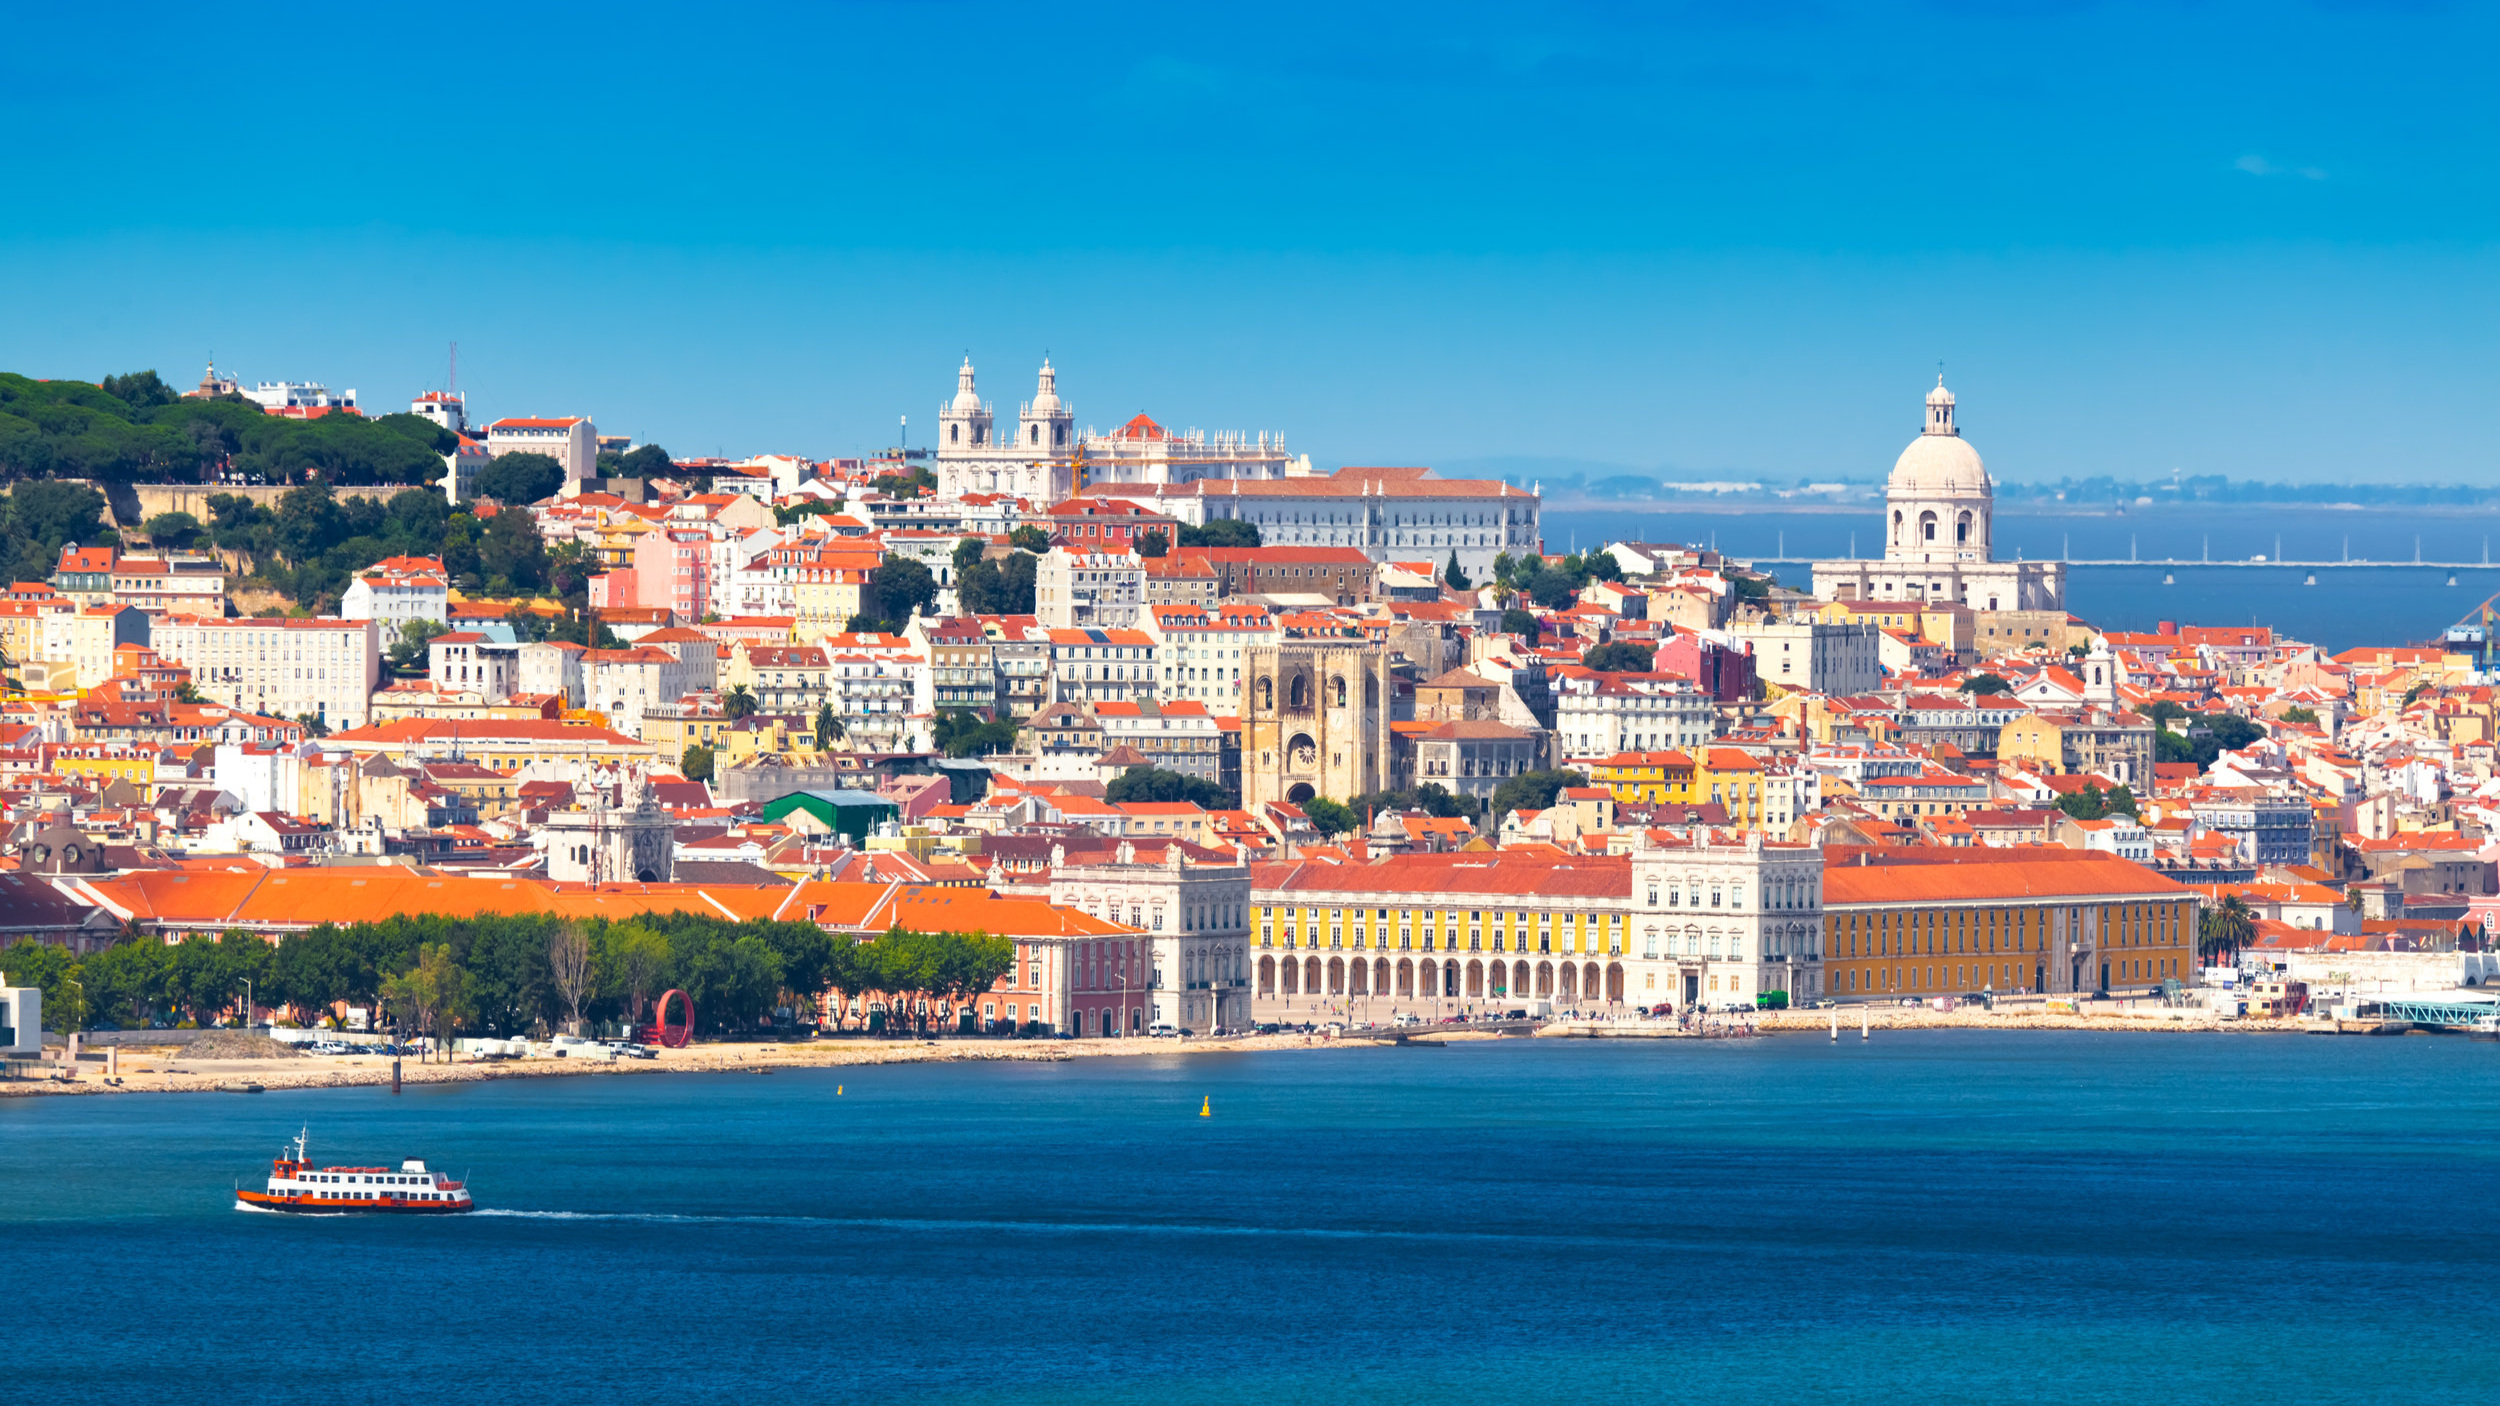 portugal_lisboa_bigstock-Lisbon-Portugal-24167762.jpg